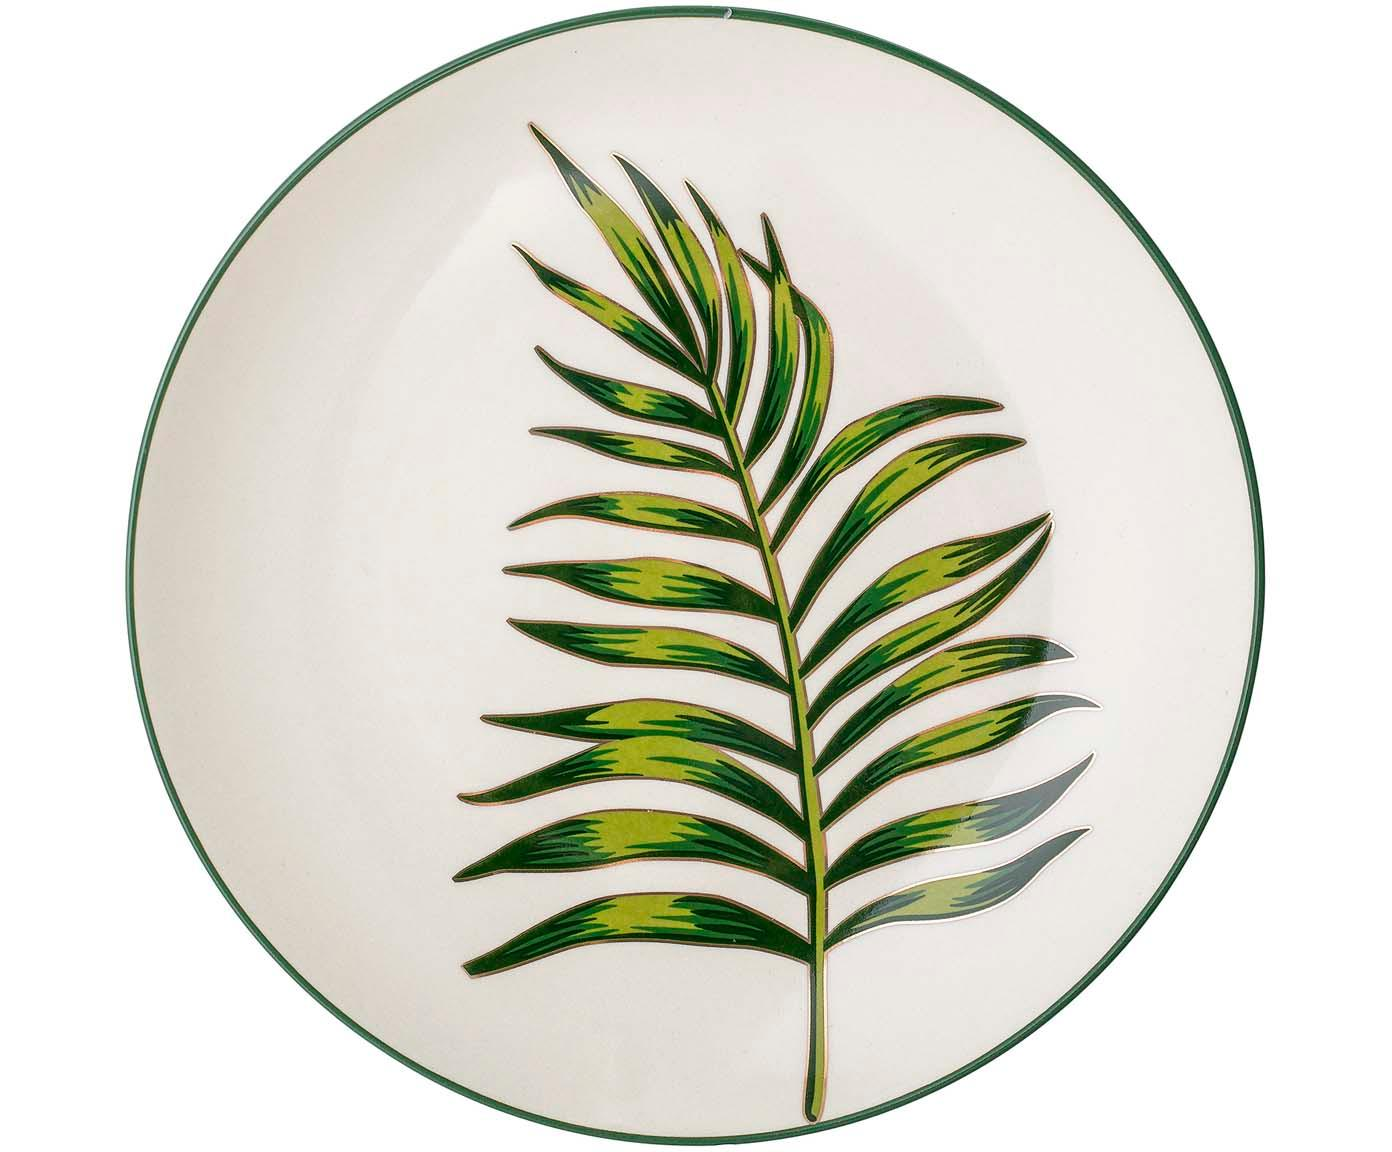 Plato llano Moana, Gres, Verde, blanco, Ø 25 cm